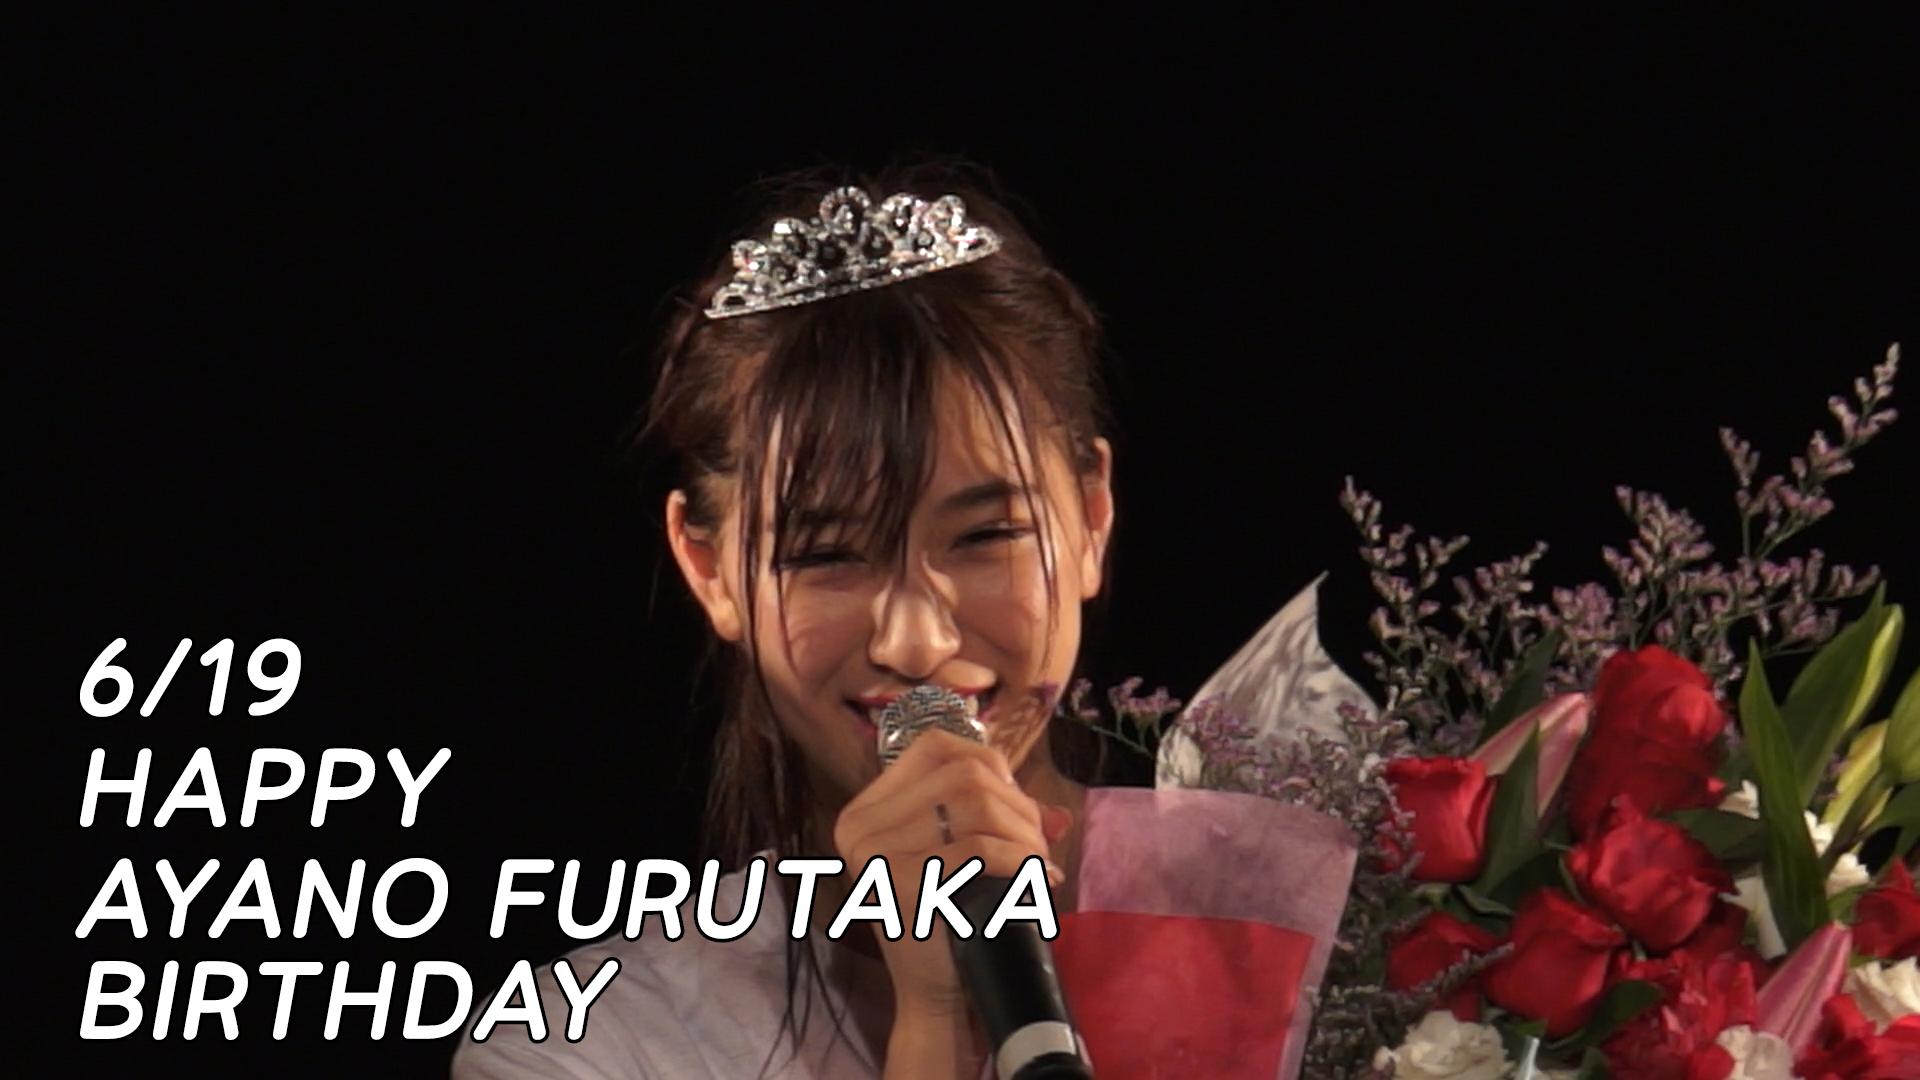 6/17 HAPPY AYANO FURUTAKA BIRTHDAY